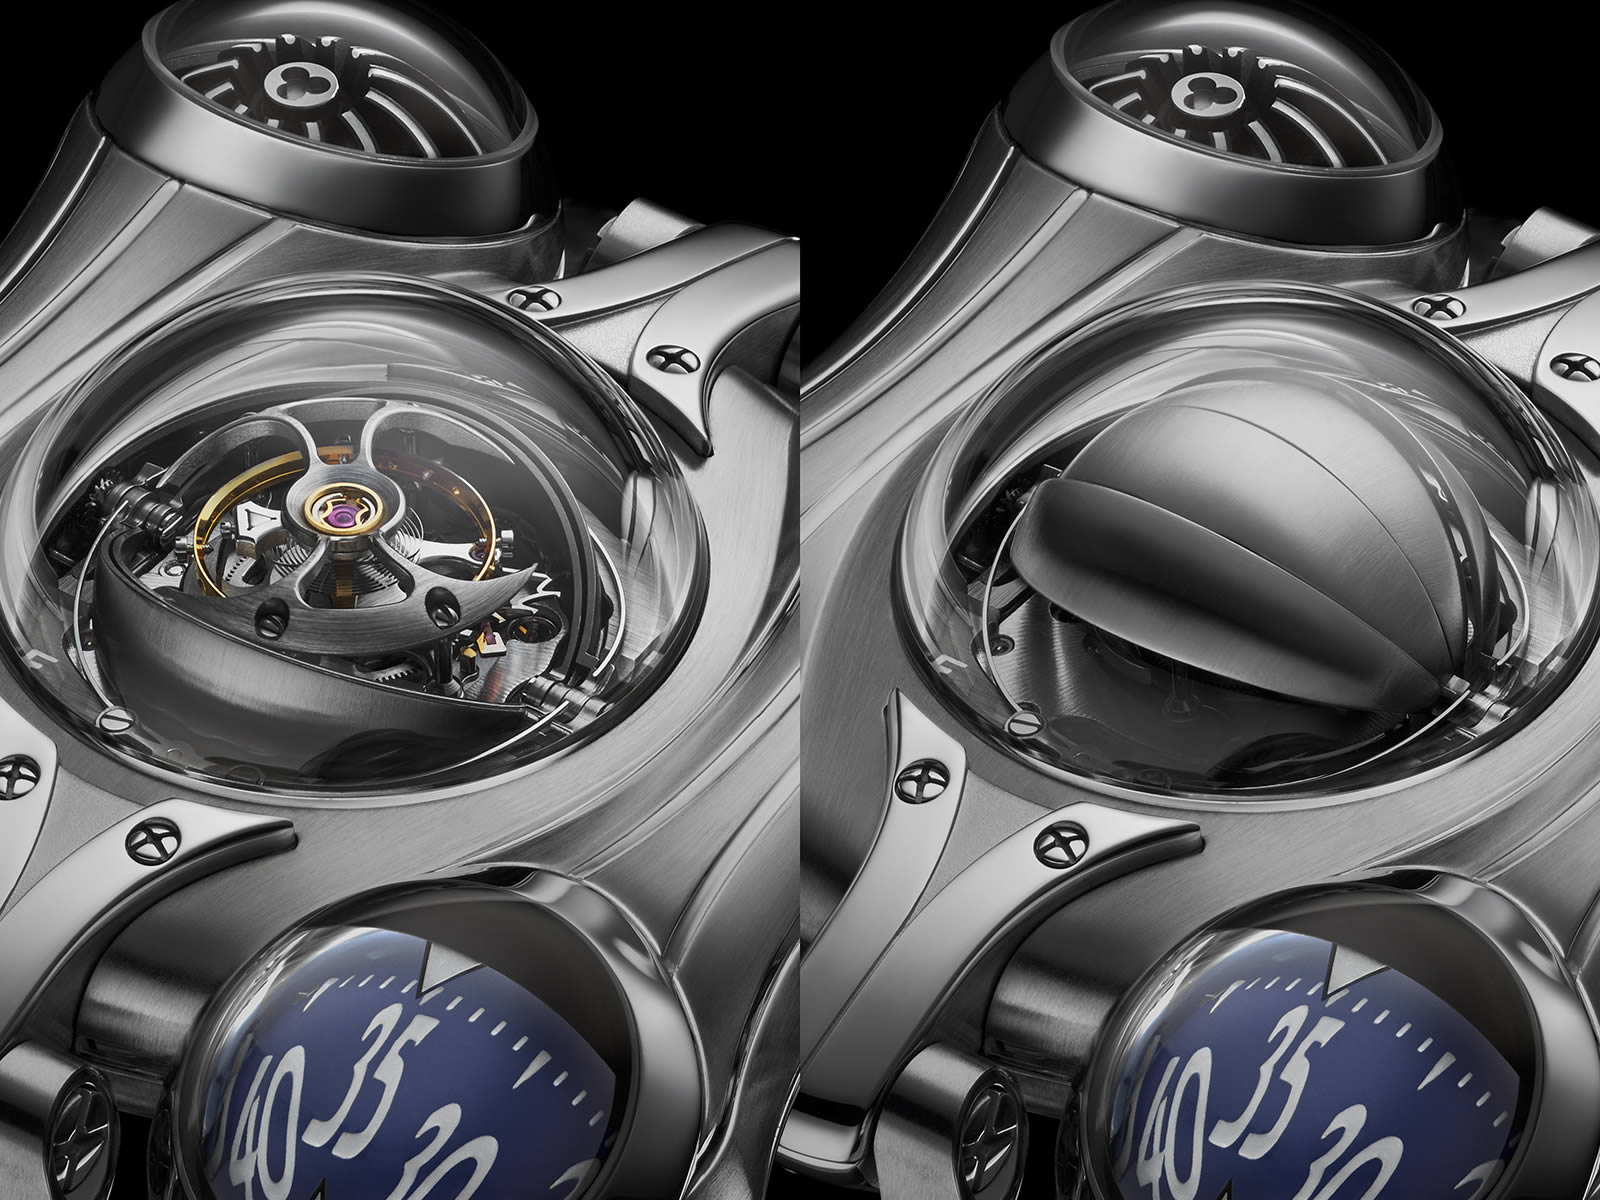 60-sl-b-mb-f-hm6-final-edition-in-steel-5-.jpg